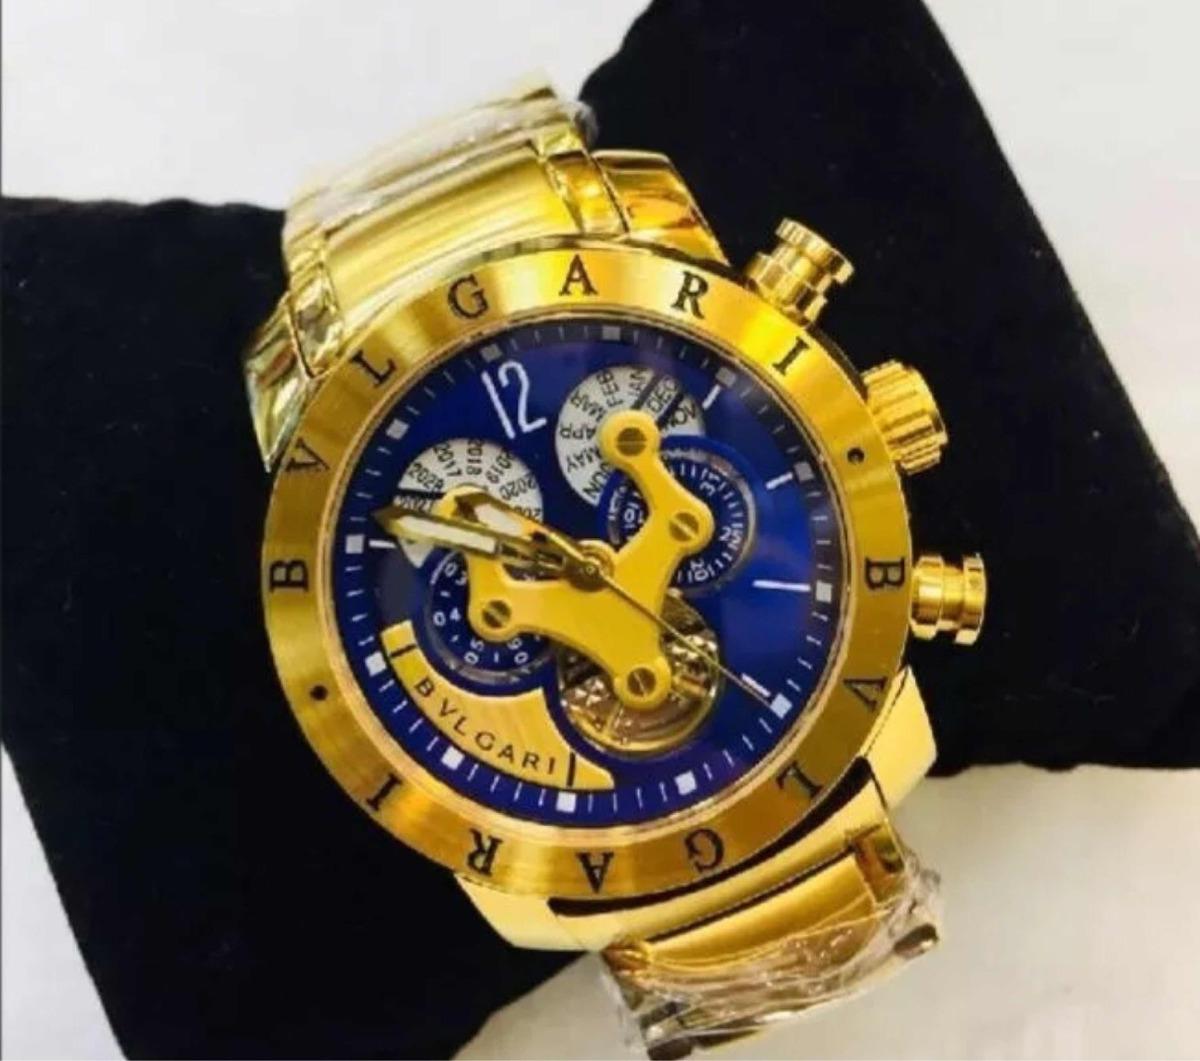 cbf510e542e relógio bvlgari iron man venon skeleton dourado prata preto. Carregando zoom .